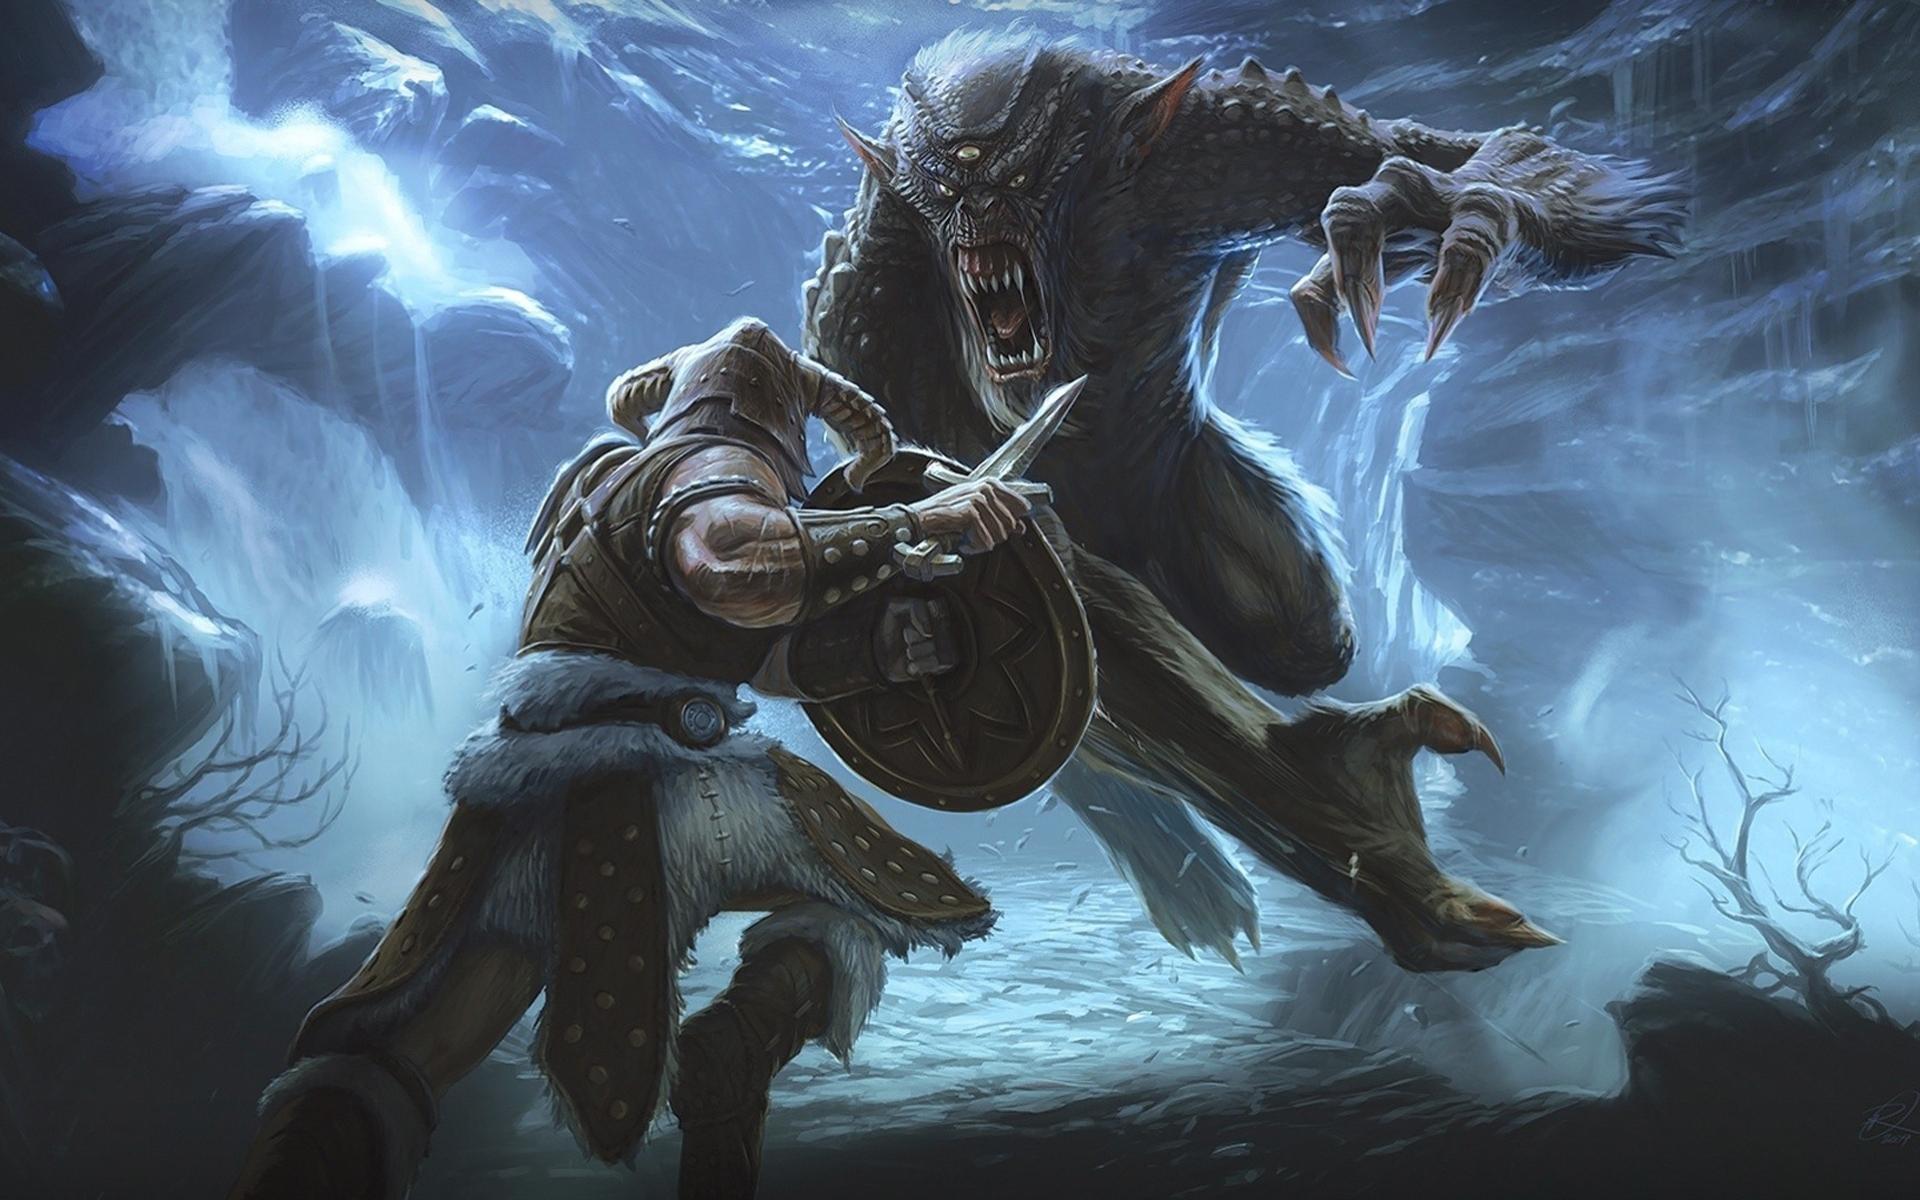 elder scrolls 5, skyrim, battle Wallpaper, HD Games 4K ...